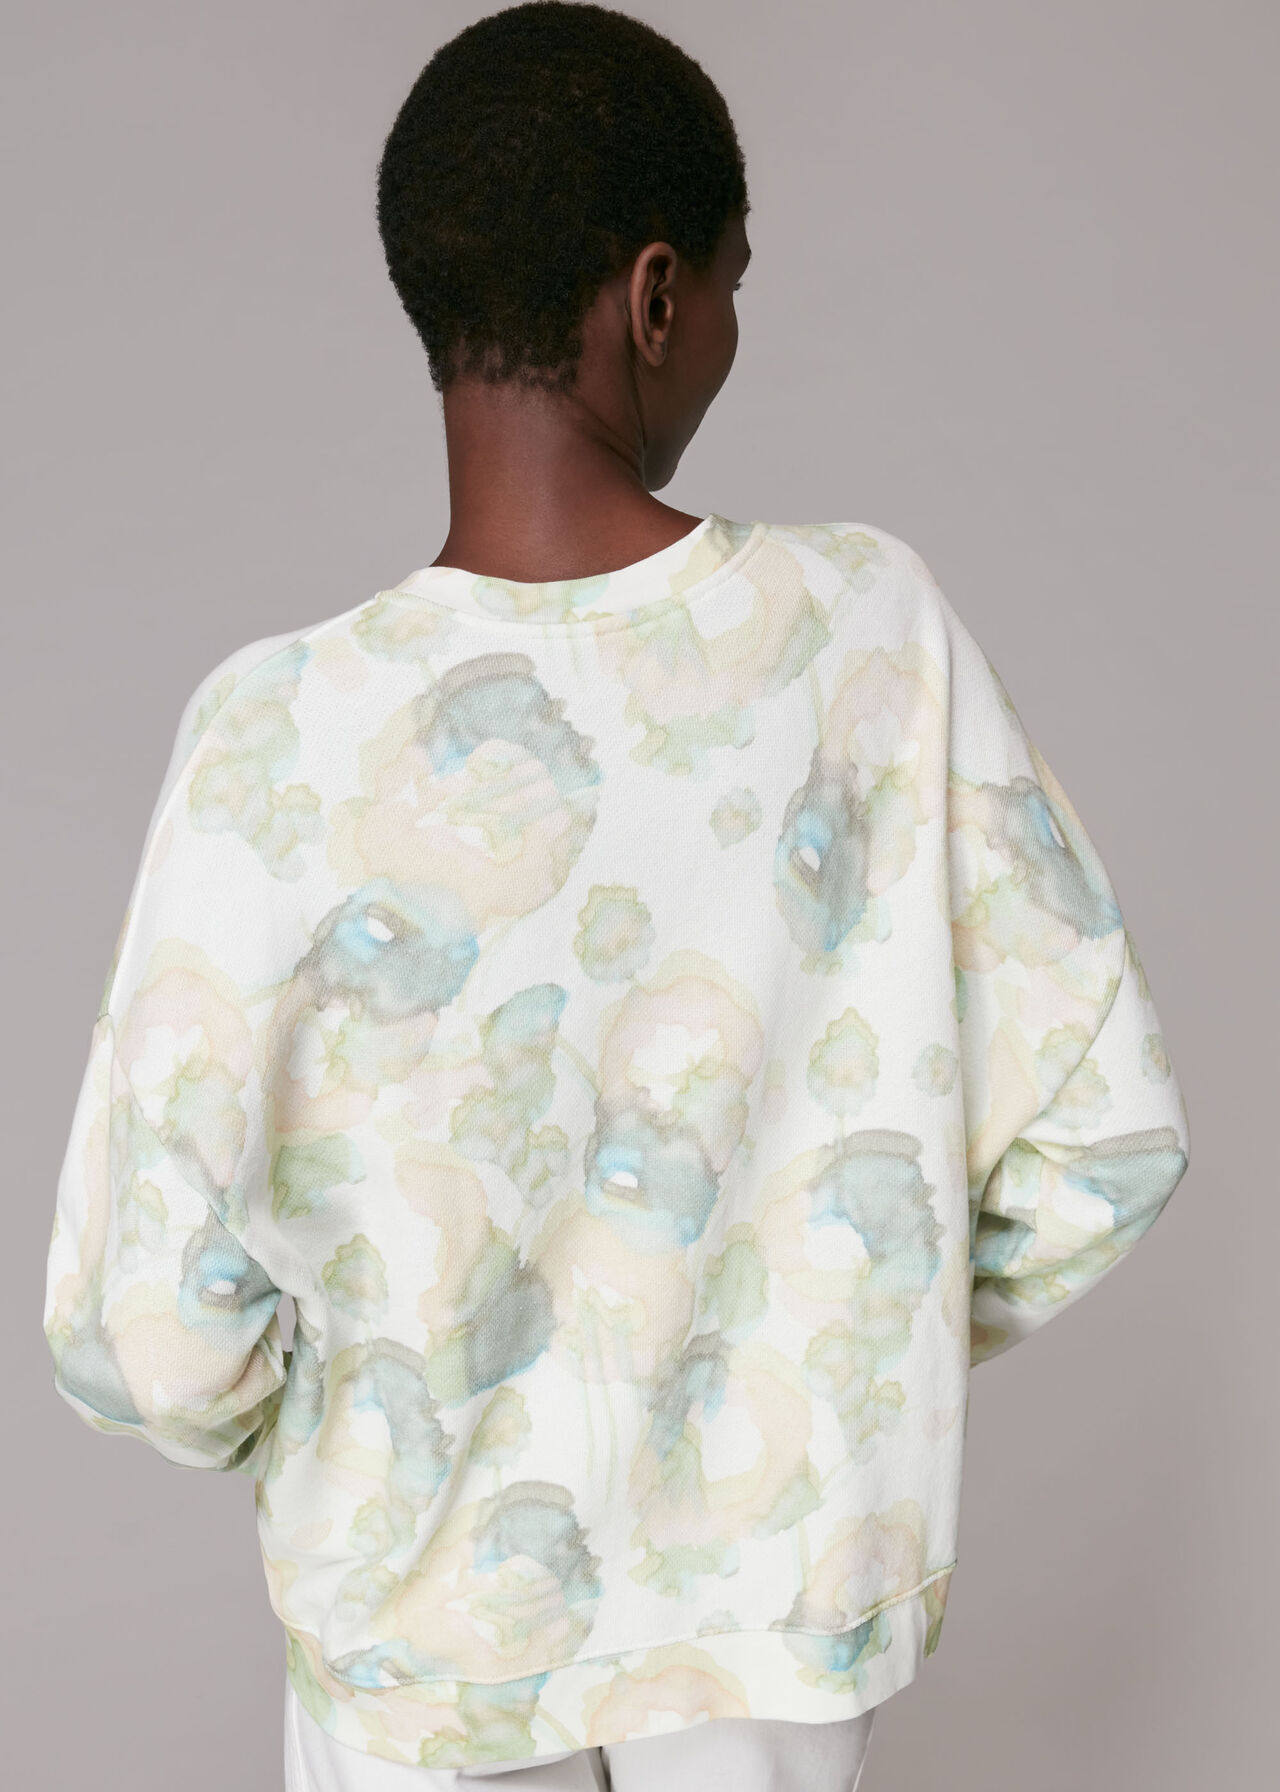 Watercolour Sweatshirt